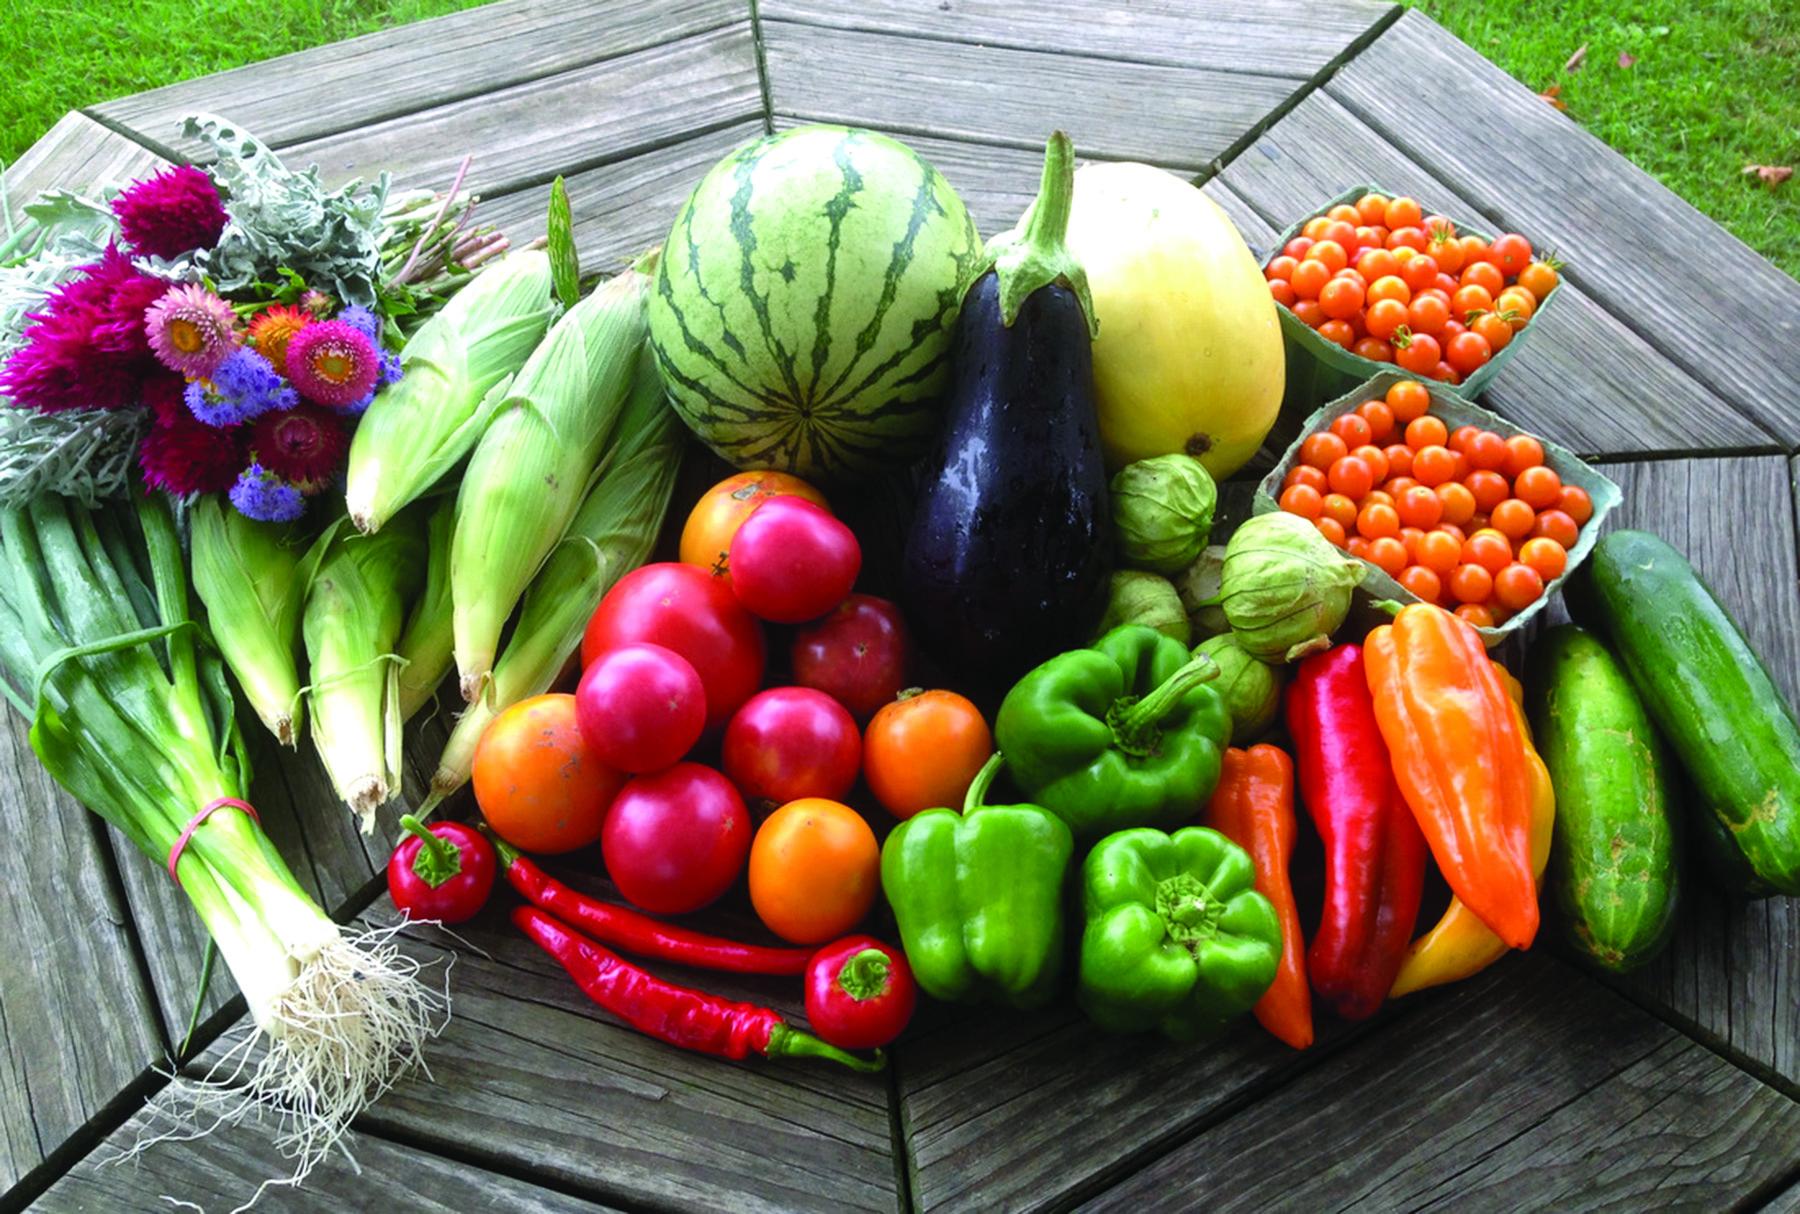 Farm.4903.produce.cmyk.jpg